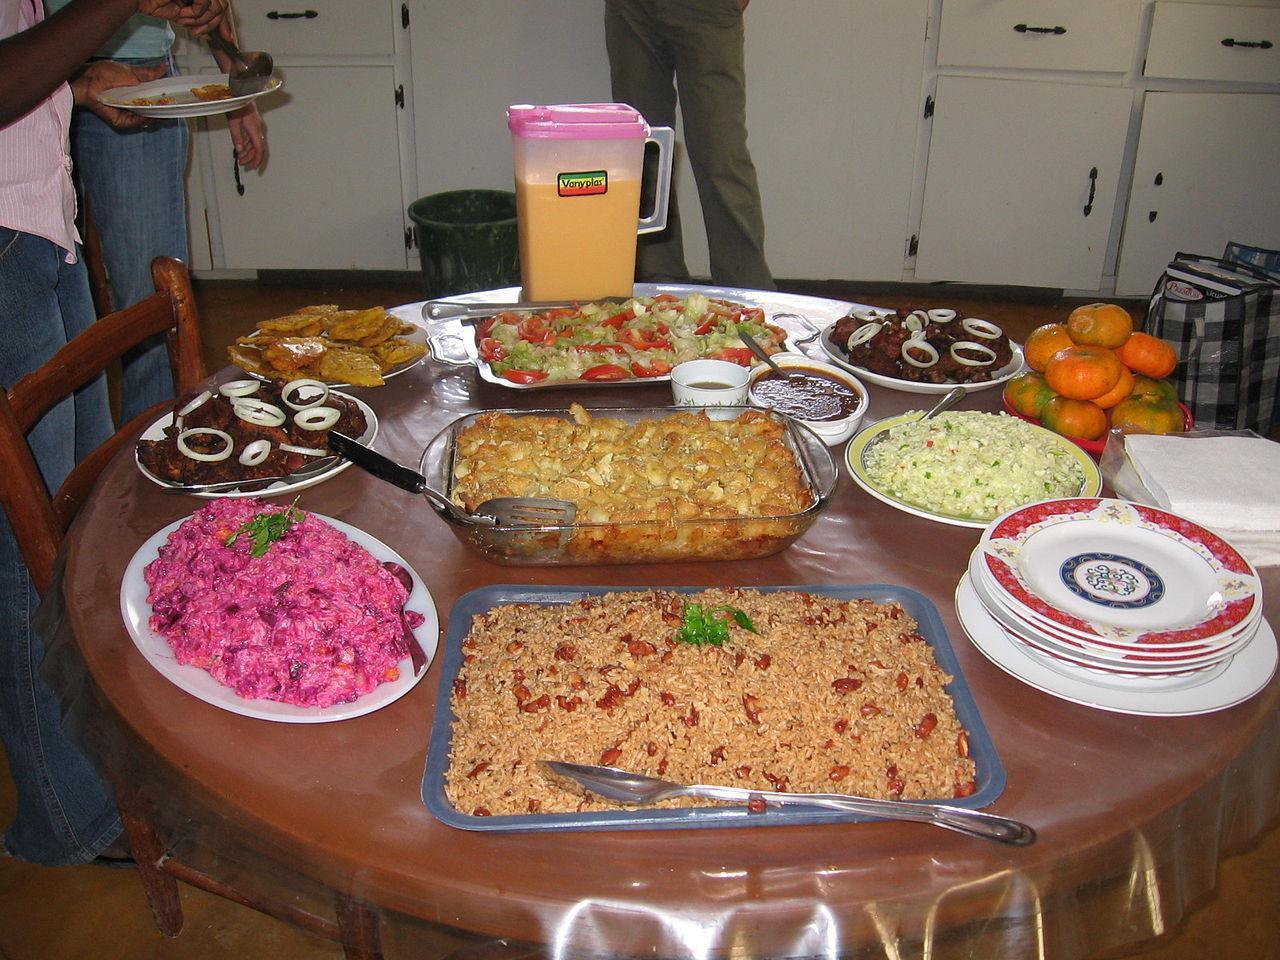 The round table 10 rezon ayisyen sipoze fye de tet yo - French creole cuisine ...